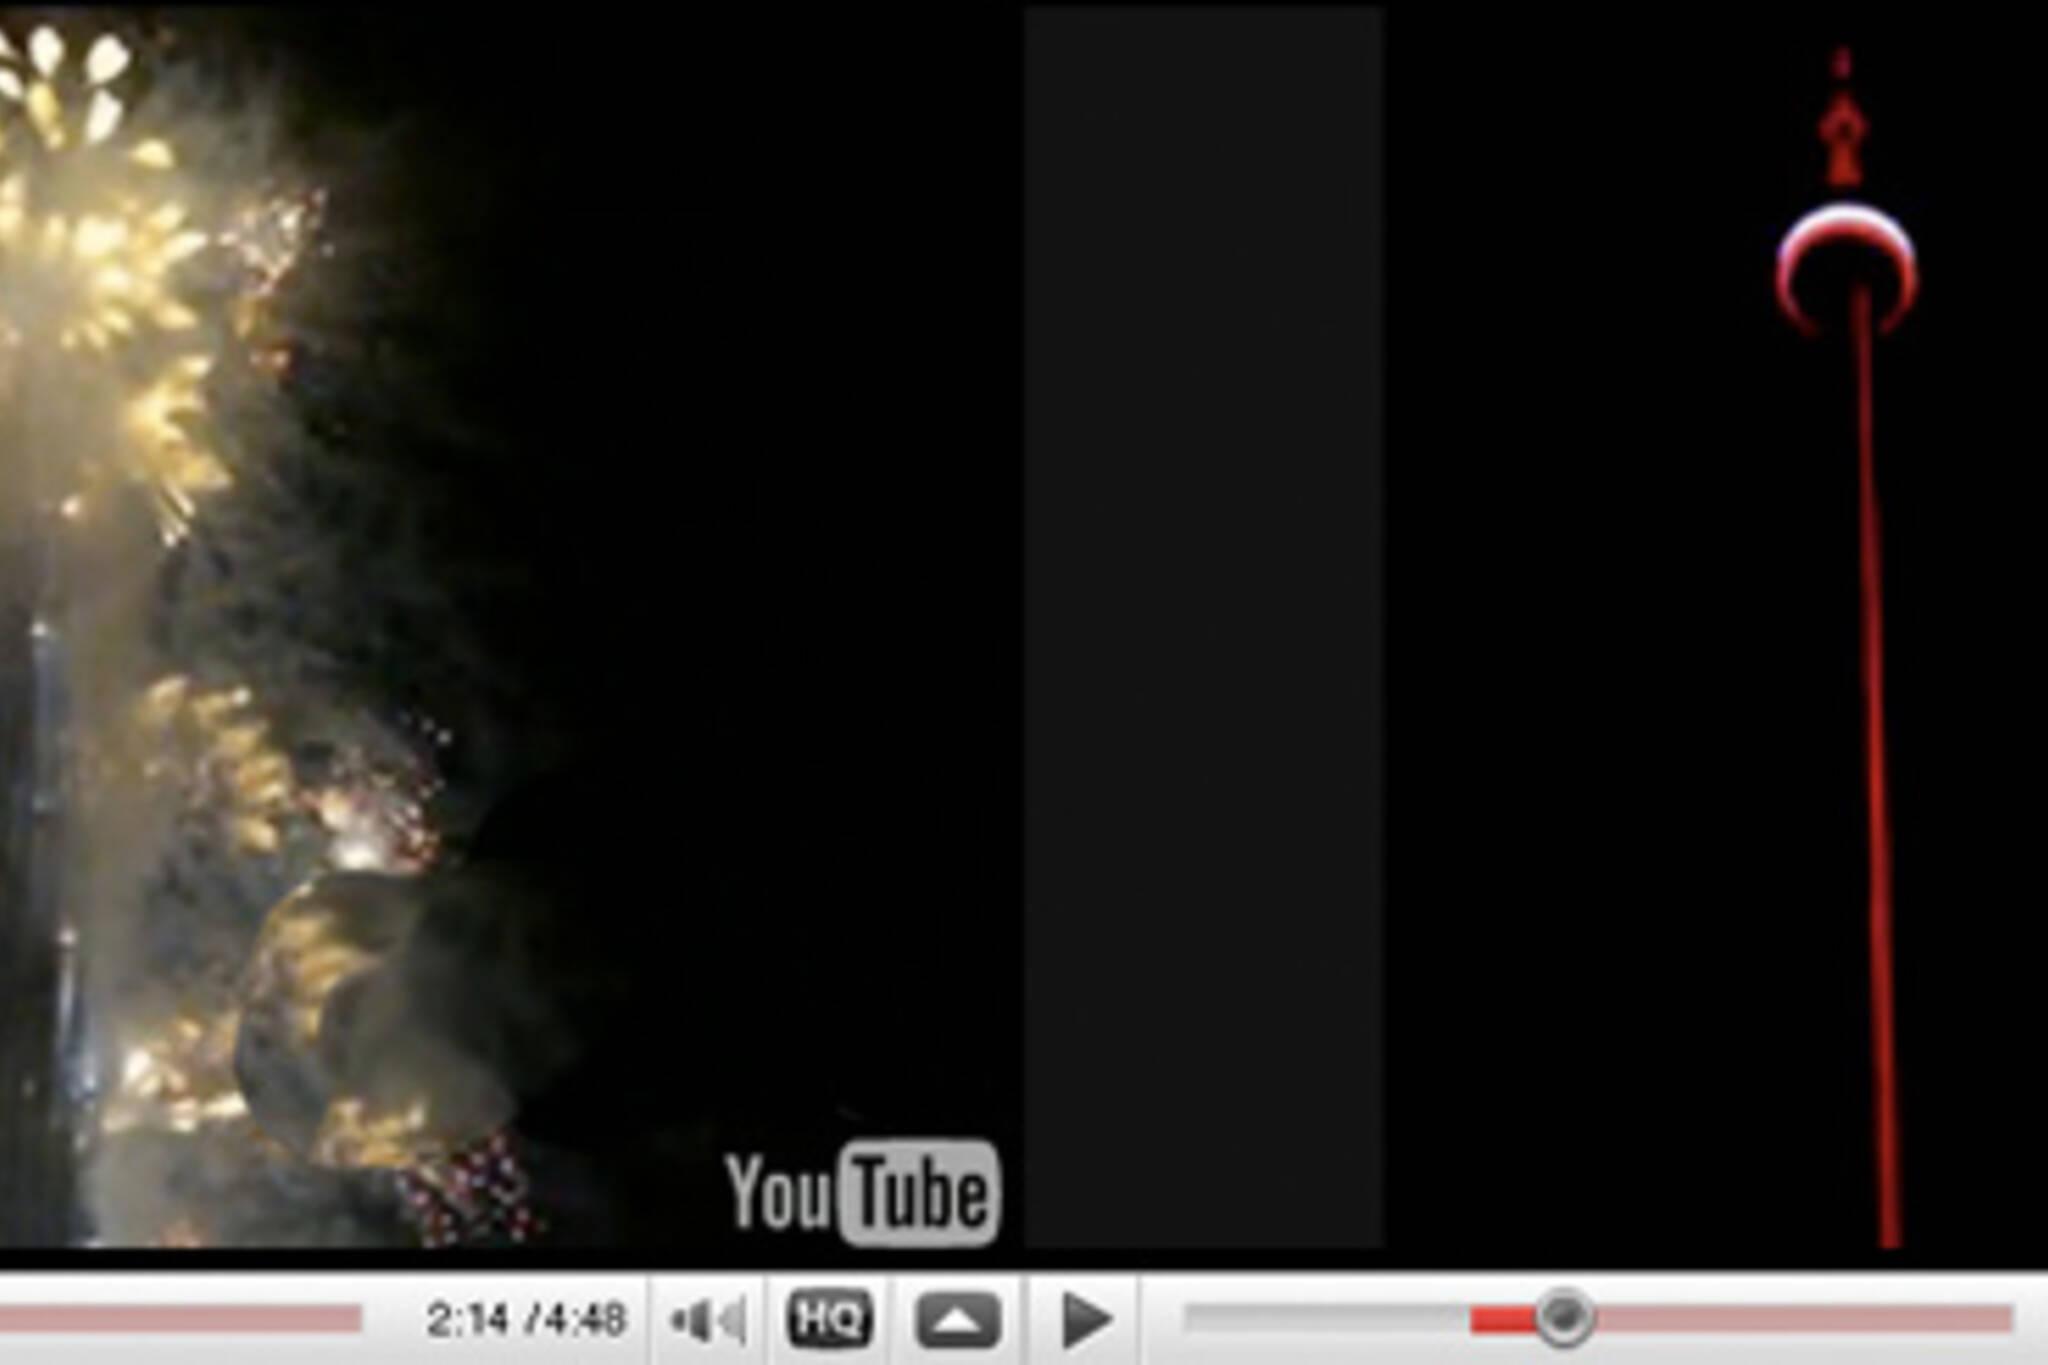 20101112_youtube-doublerA.jpg